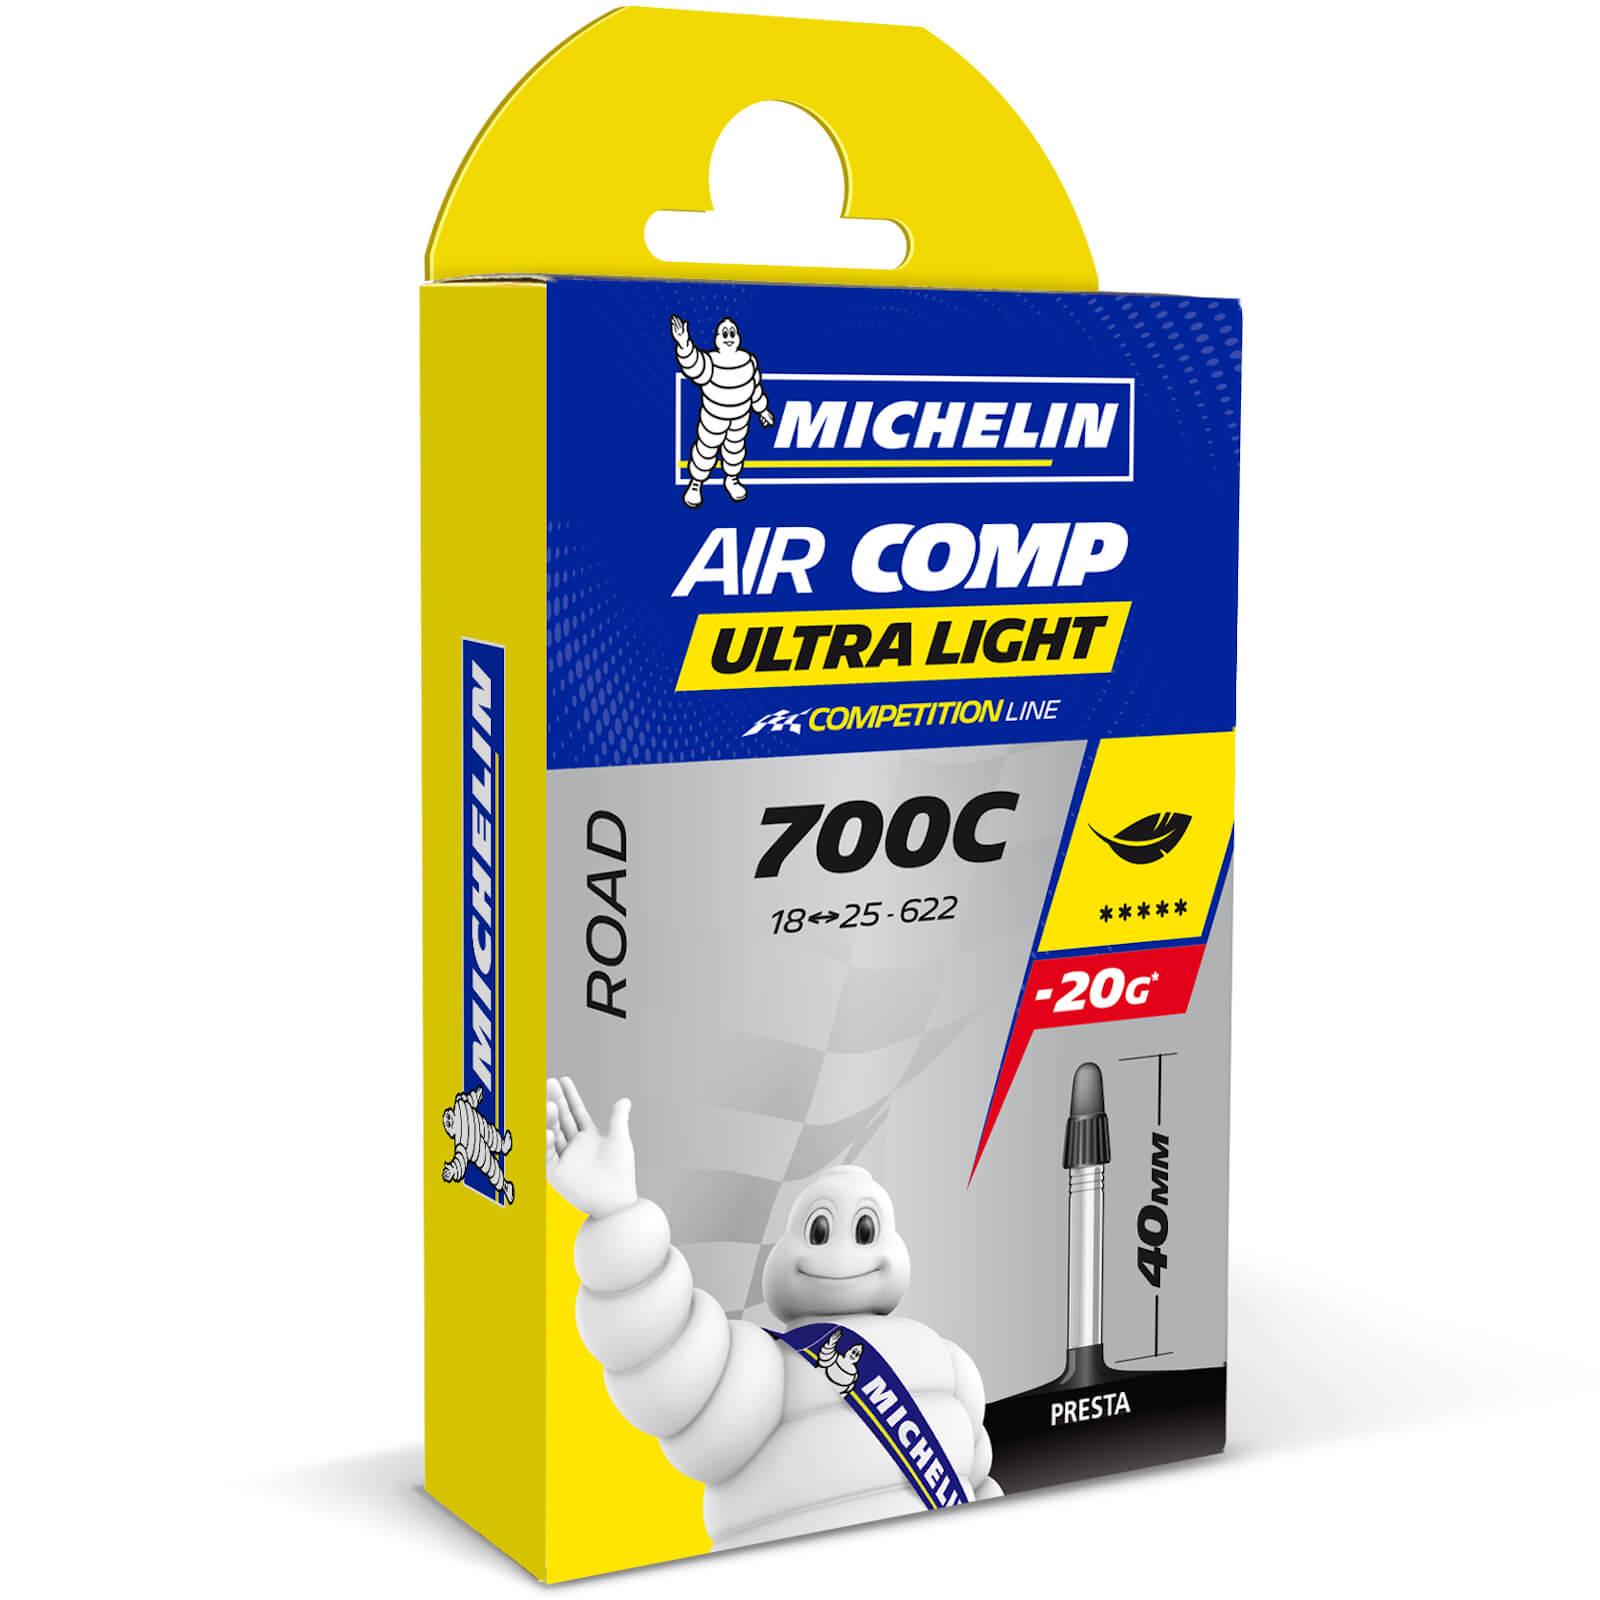 Michelin A1 Aircomp Ultralight Road Inner Tube - 700c x 18-25mm - Presta 60mm